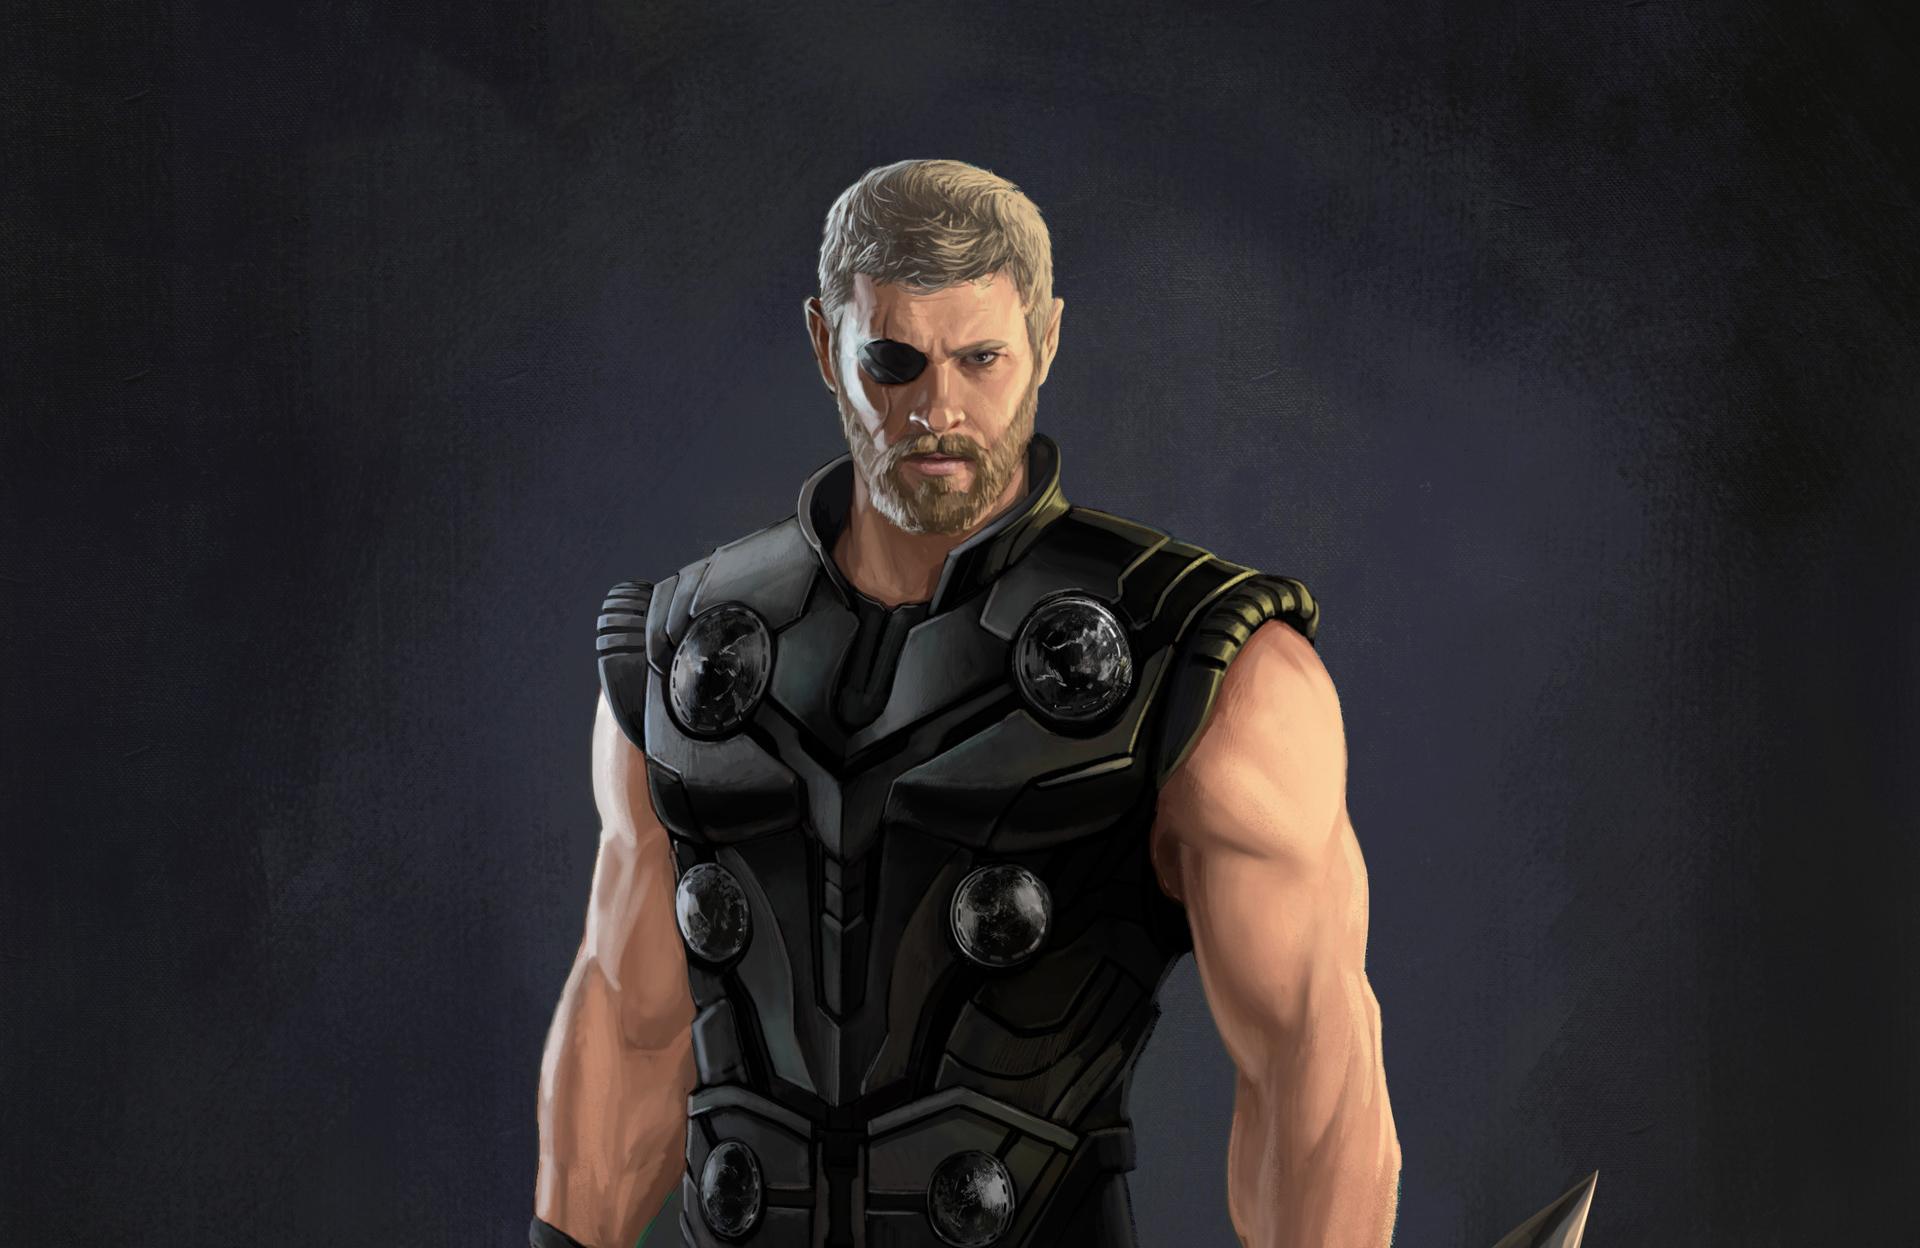 1600x1200 Thor Avengers Infinity War Artwork 1600x1200 Resolution Hd